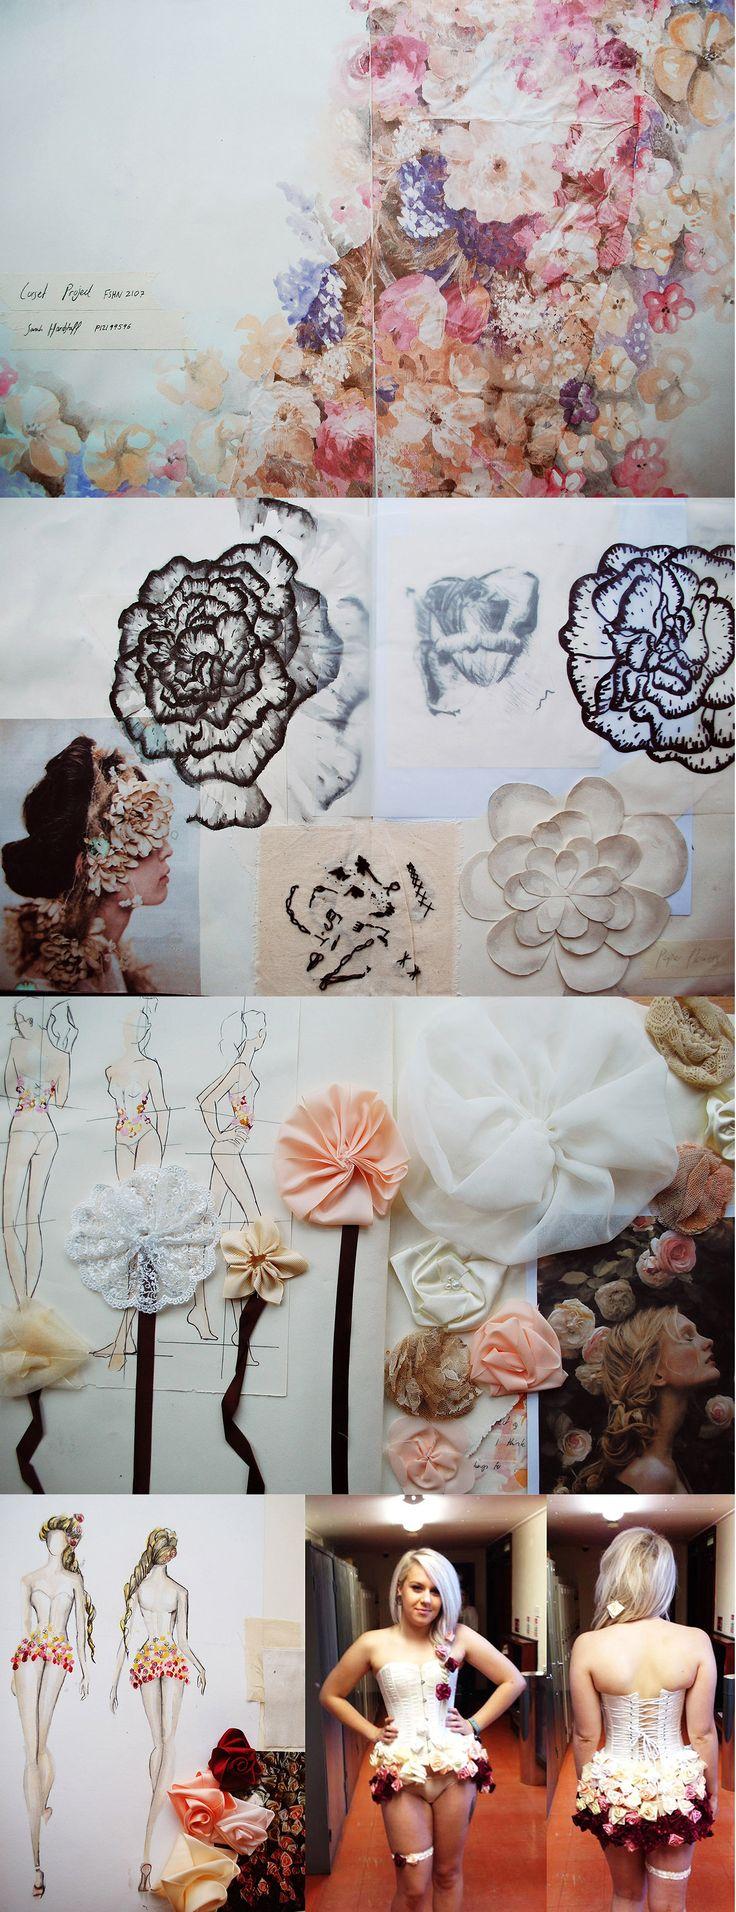 Contour Fashion Portfolio - corset project, fashion design & development - fashion sketchbook, research, illustrations, fabric flower samples & final design // Sarah Elizabeth